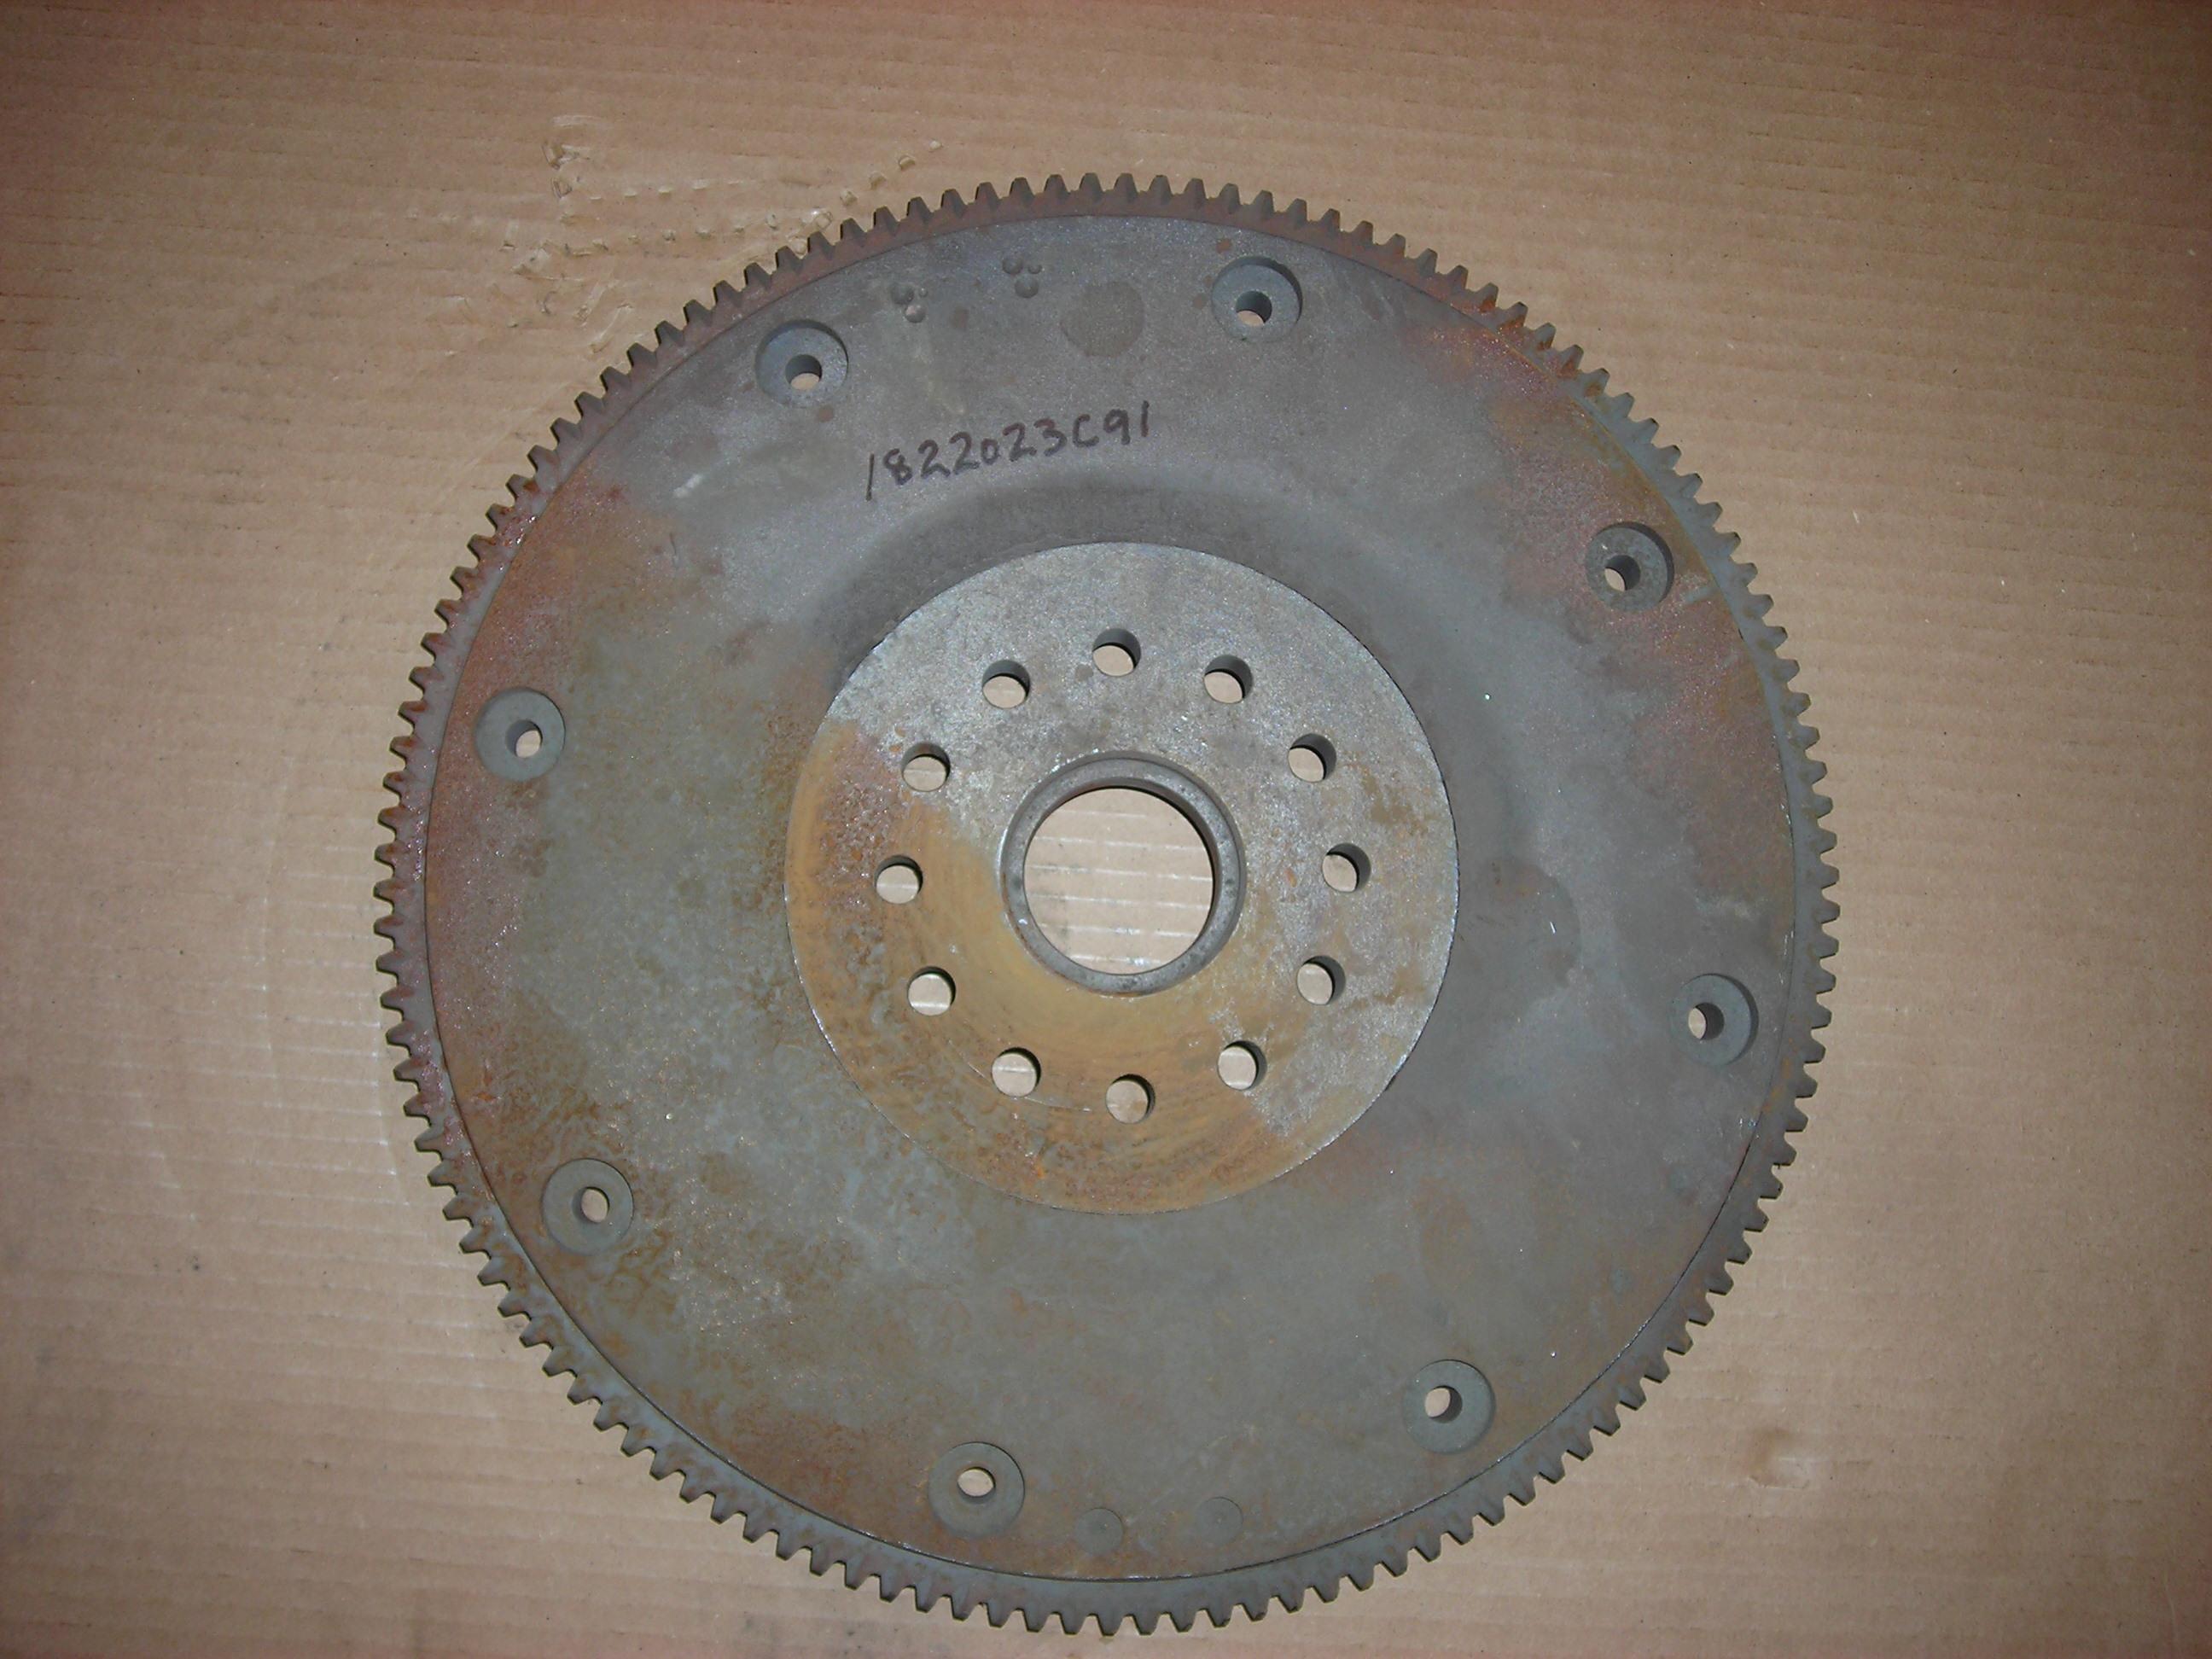 1822023C91 Navistar International Flywheel Front